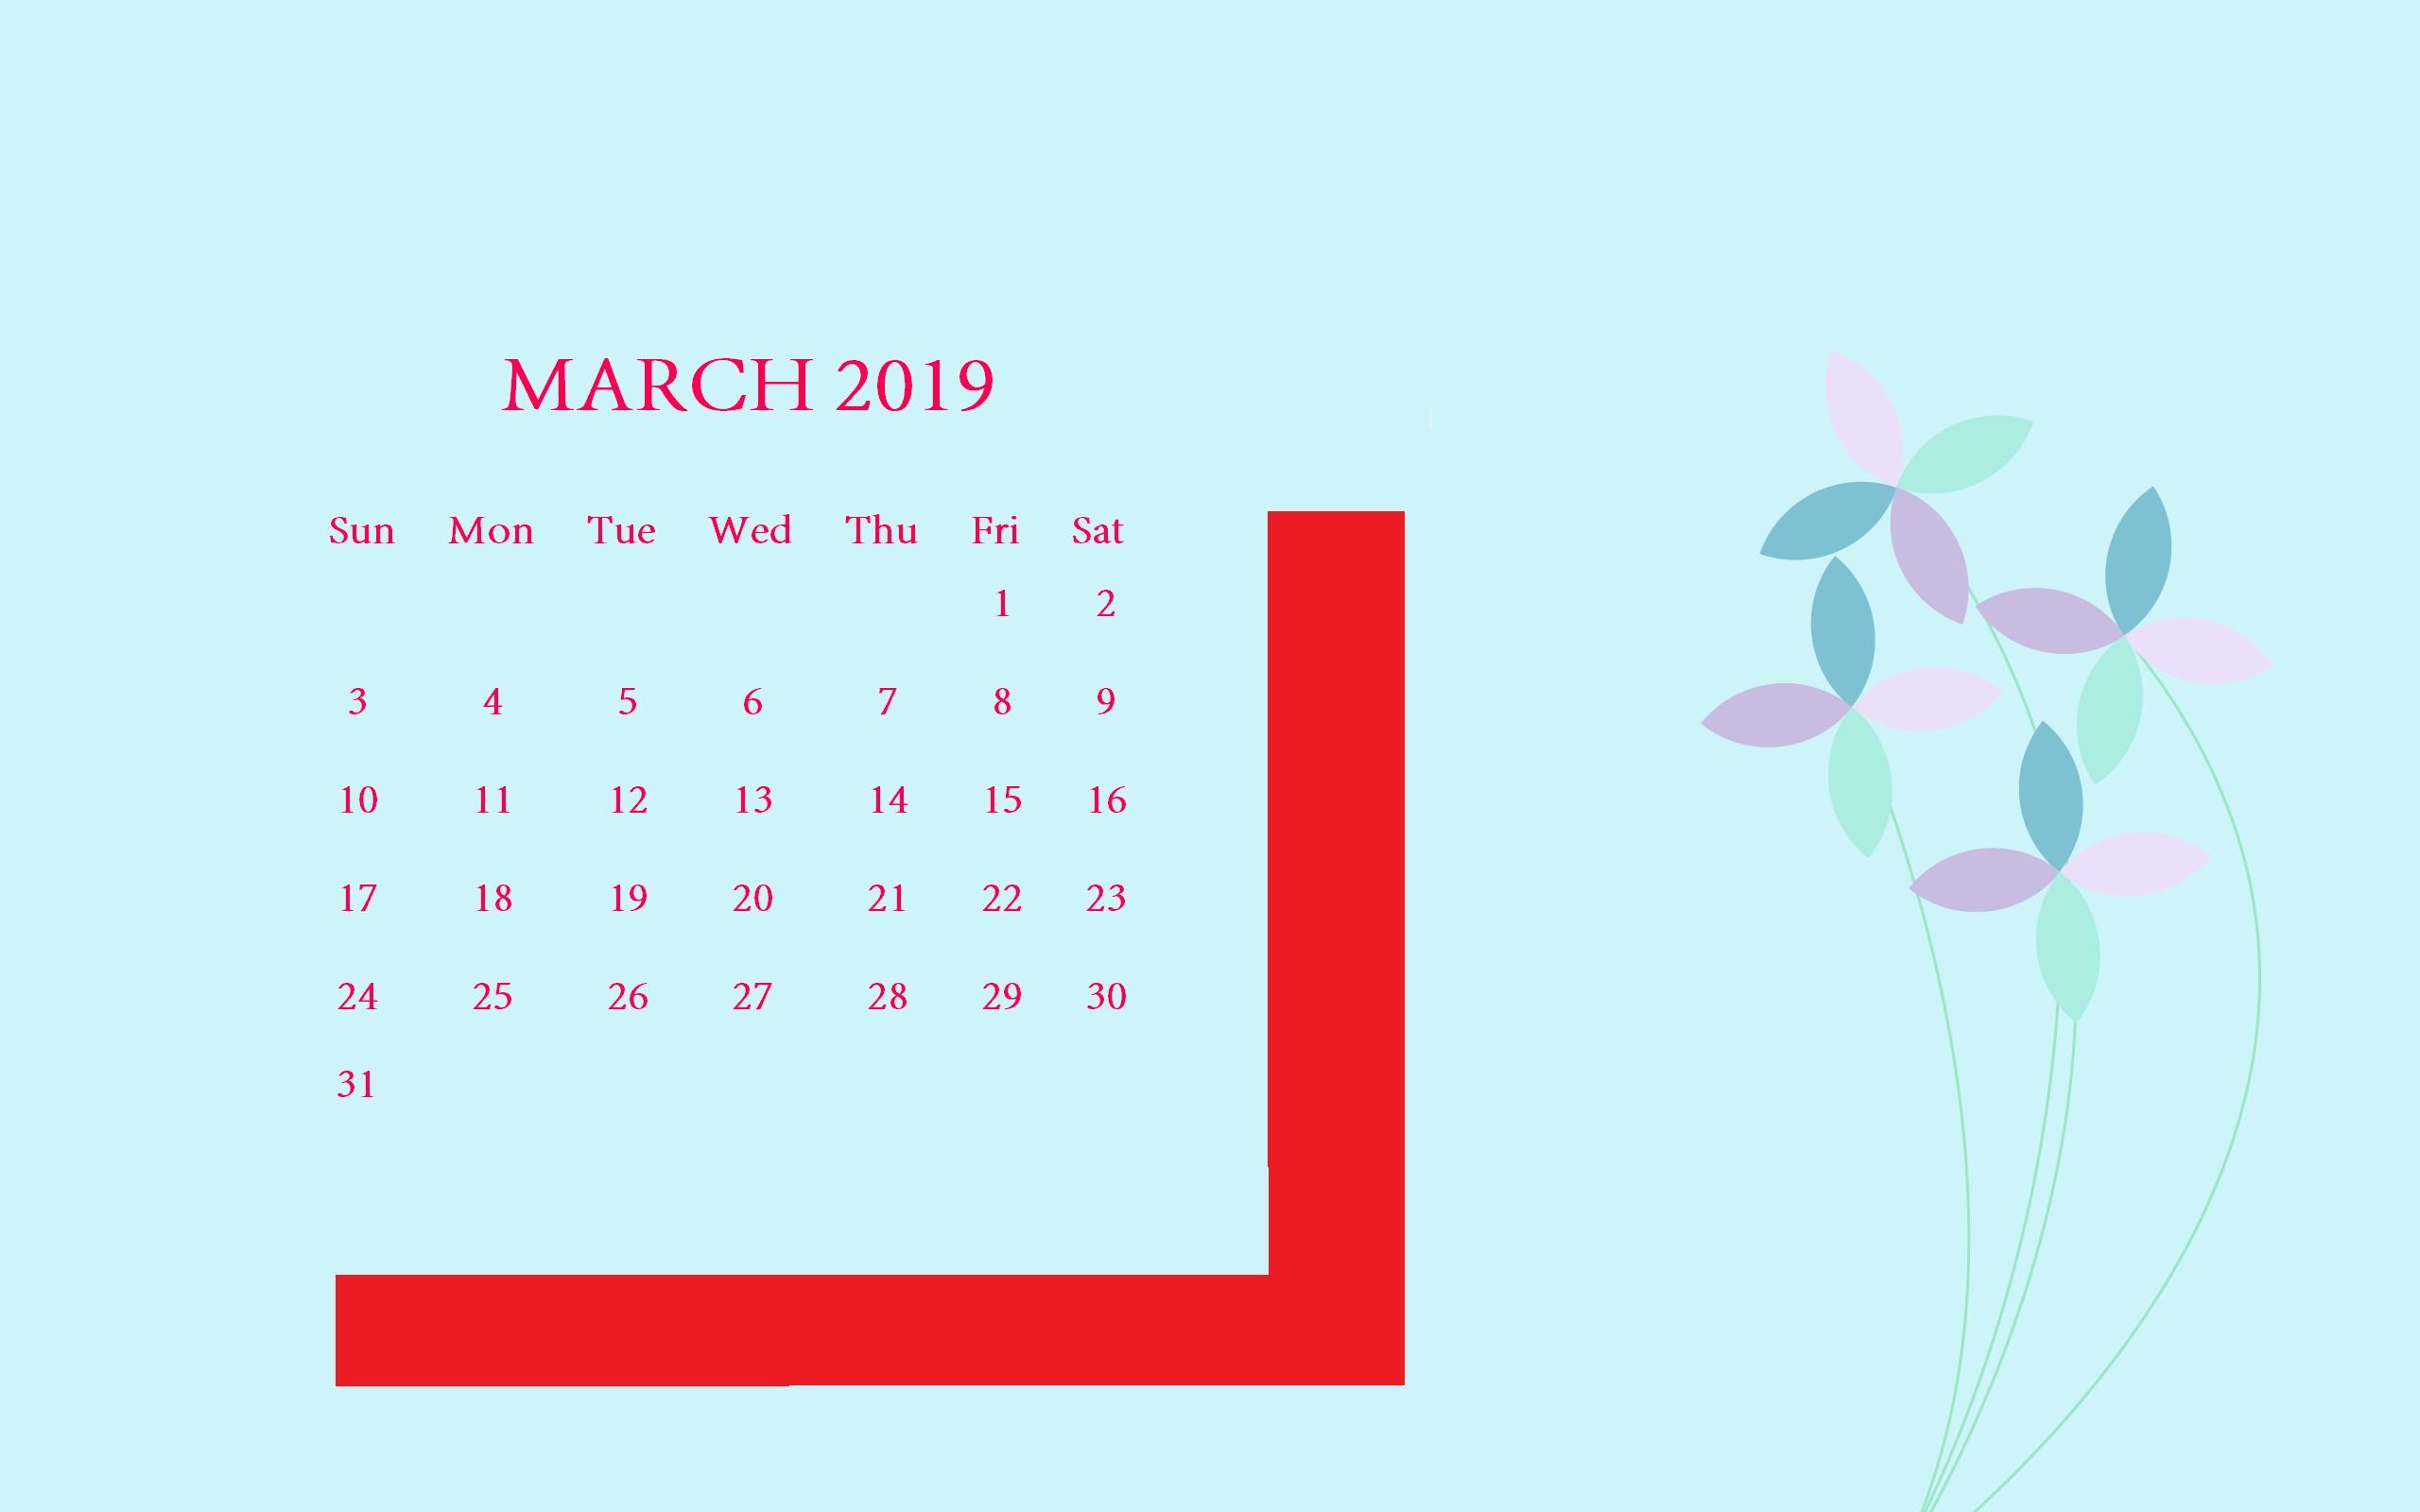 Flowers March 2019 Desktop Calendar march march2019 march2019desktopcalendar Monthly Calendar Template Blank